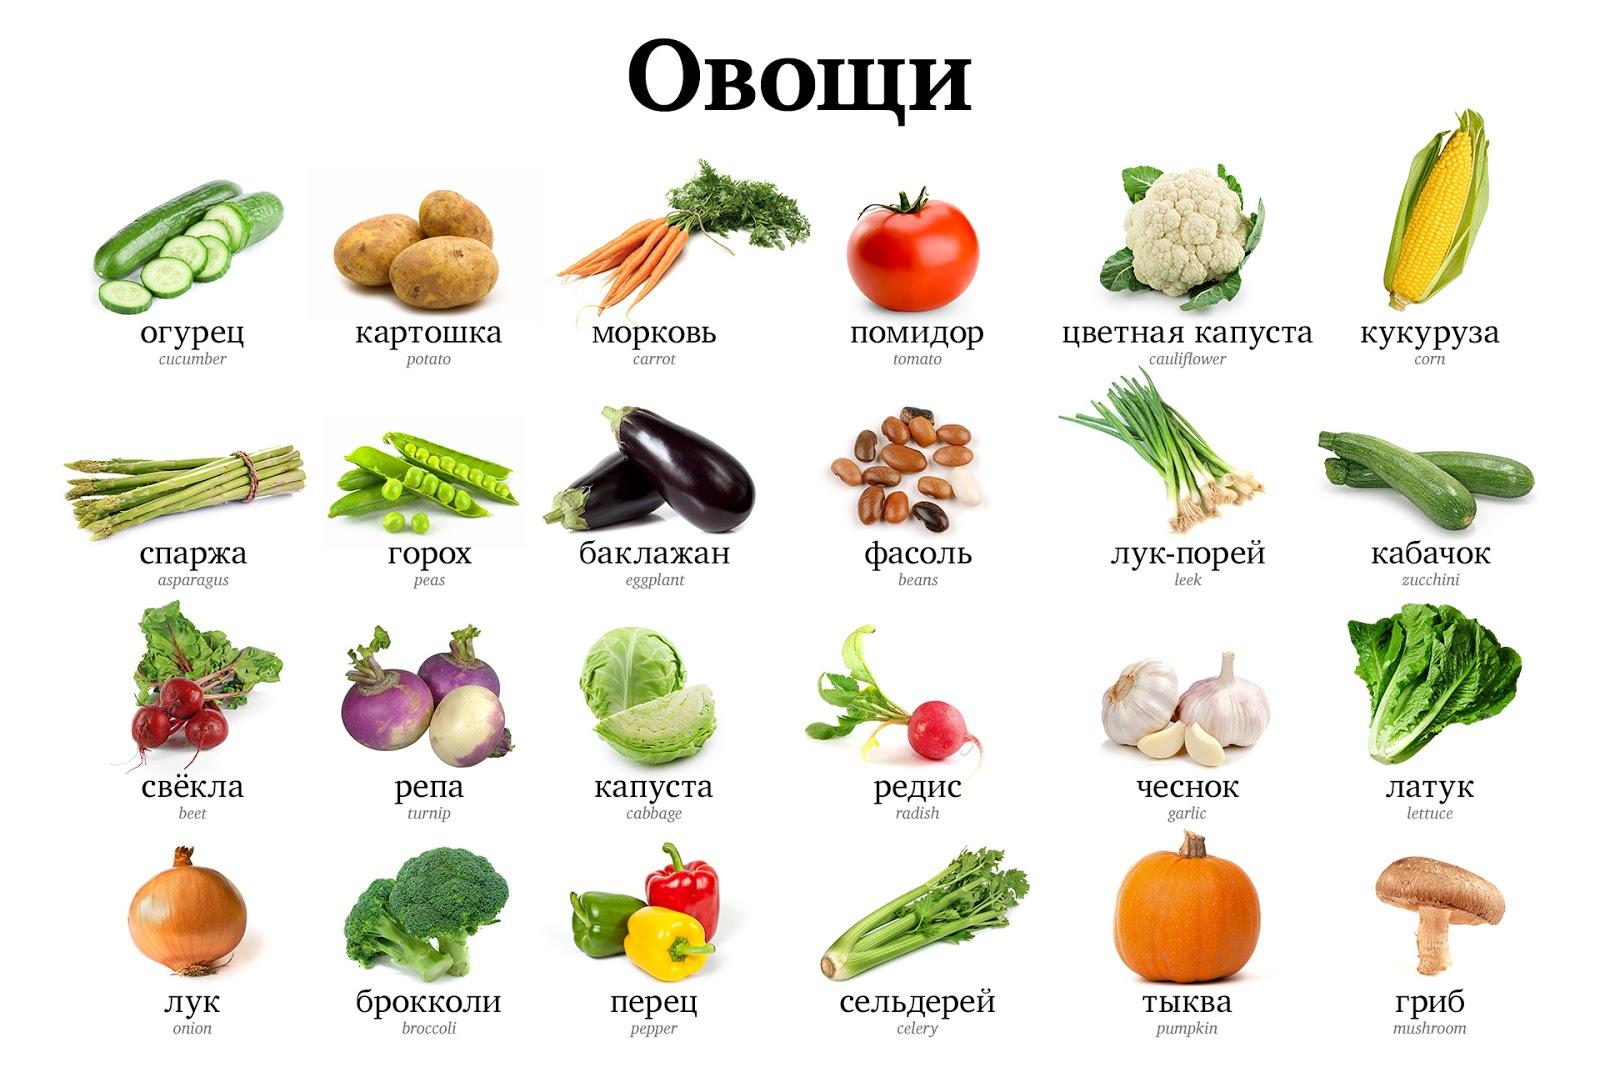 Vegetable Vocabulary